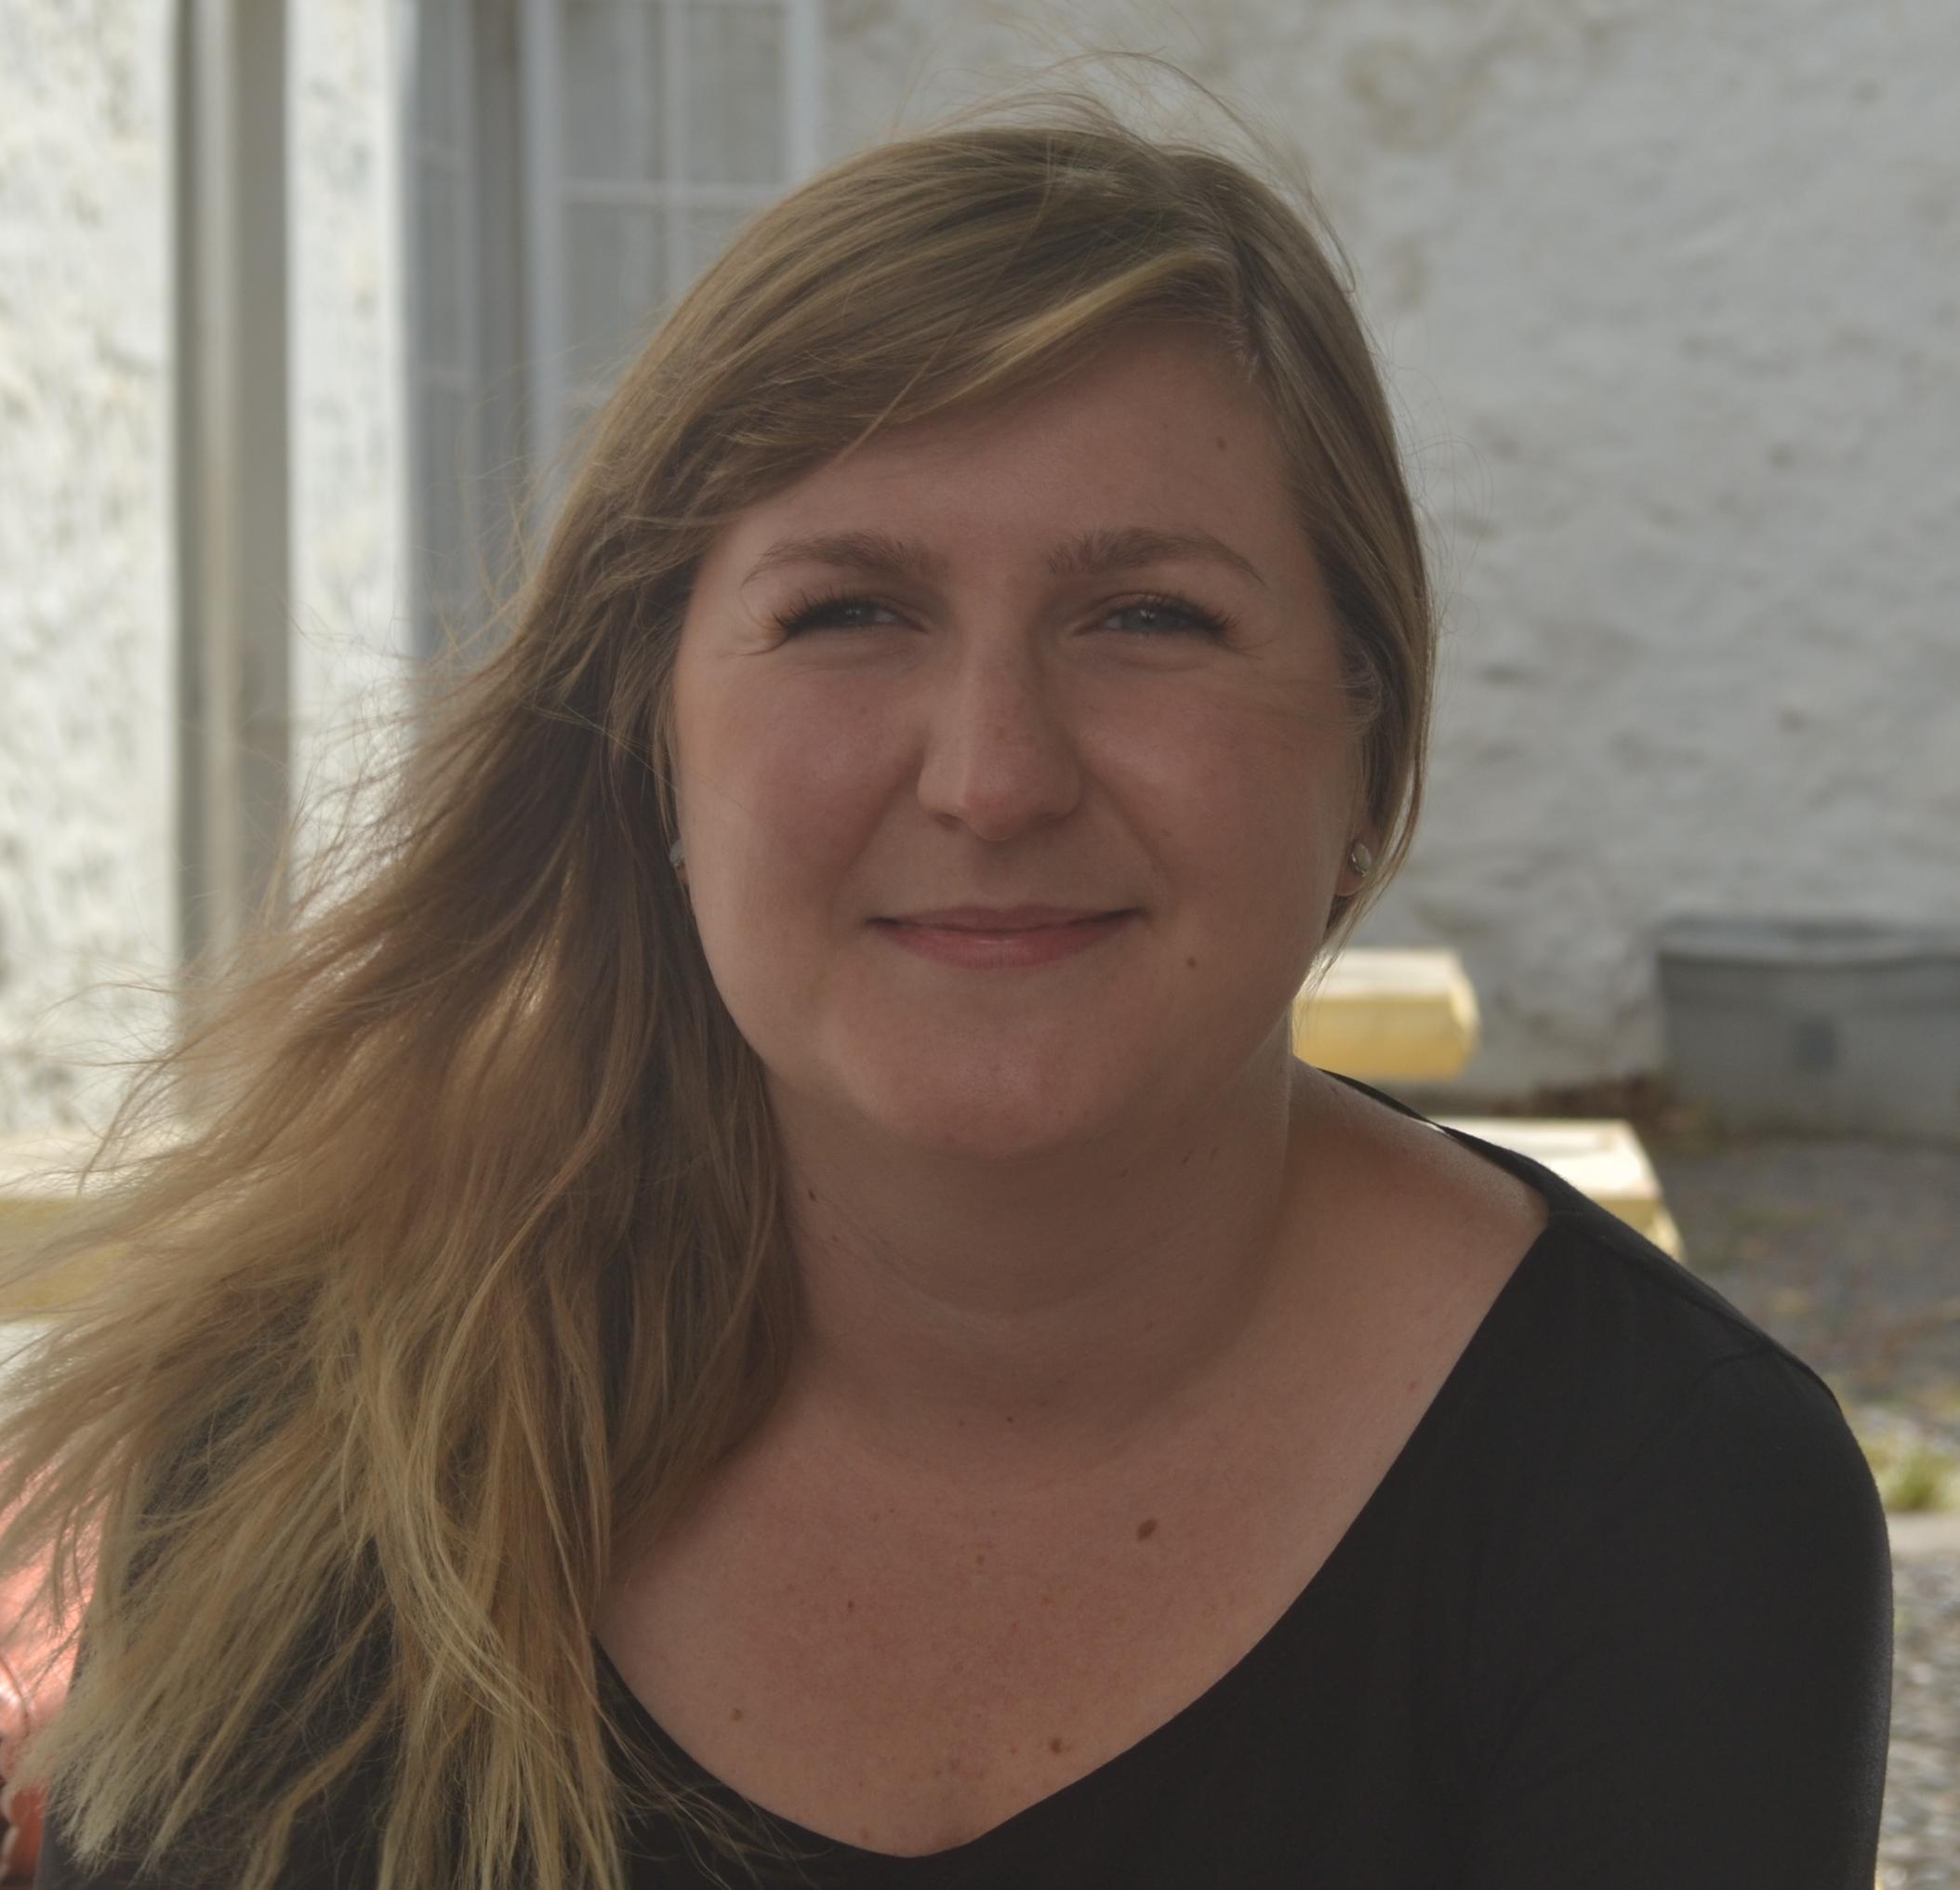 Jennifer swire home made sex video properties